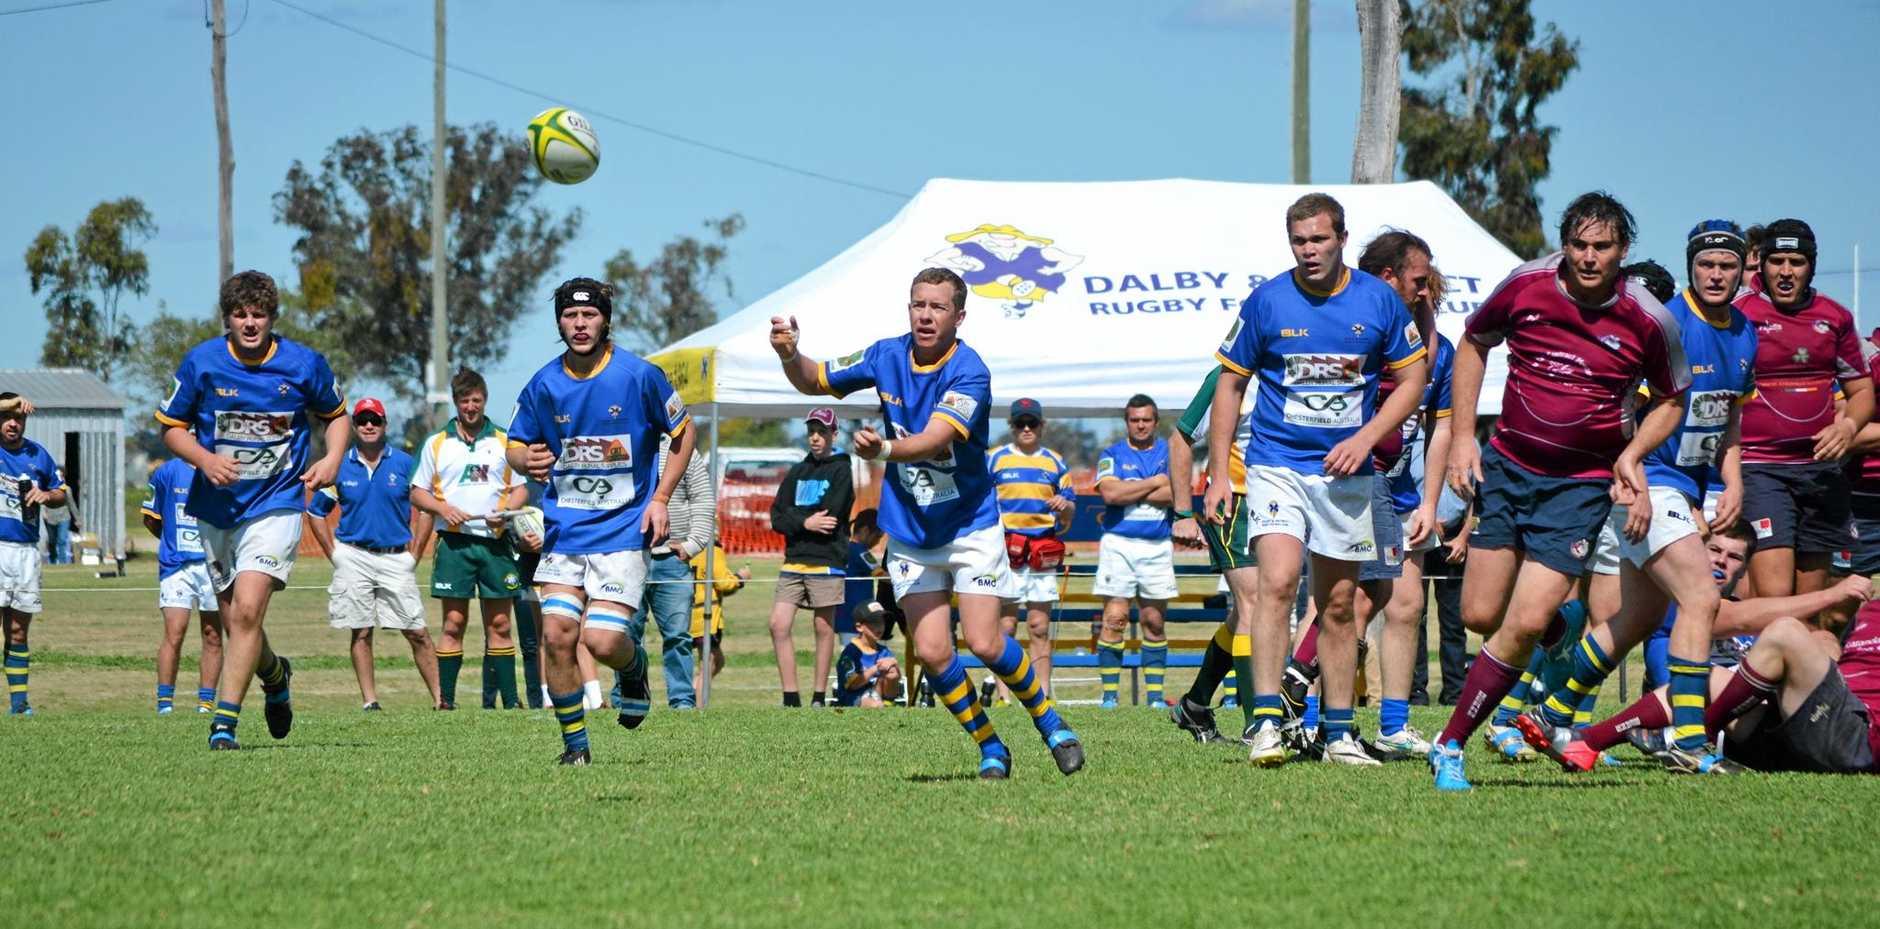 The Dalby Wheatmen B-grade v the Toowoomba Bears. Photo Alasdair Young / Dalby Herald